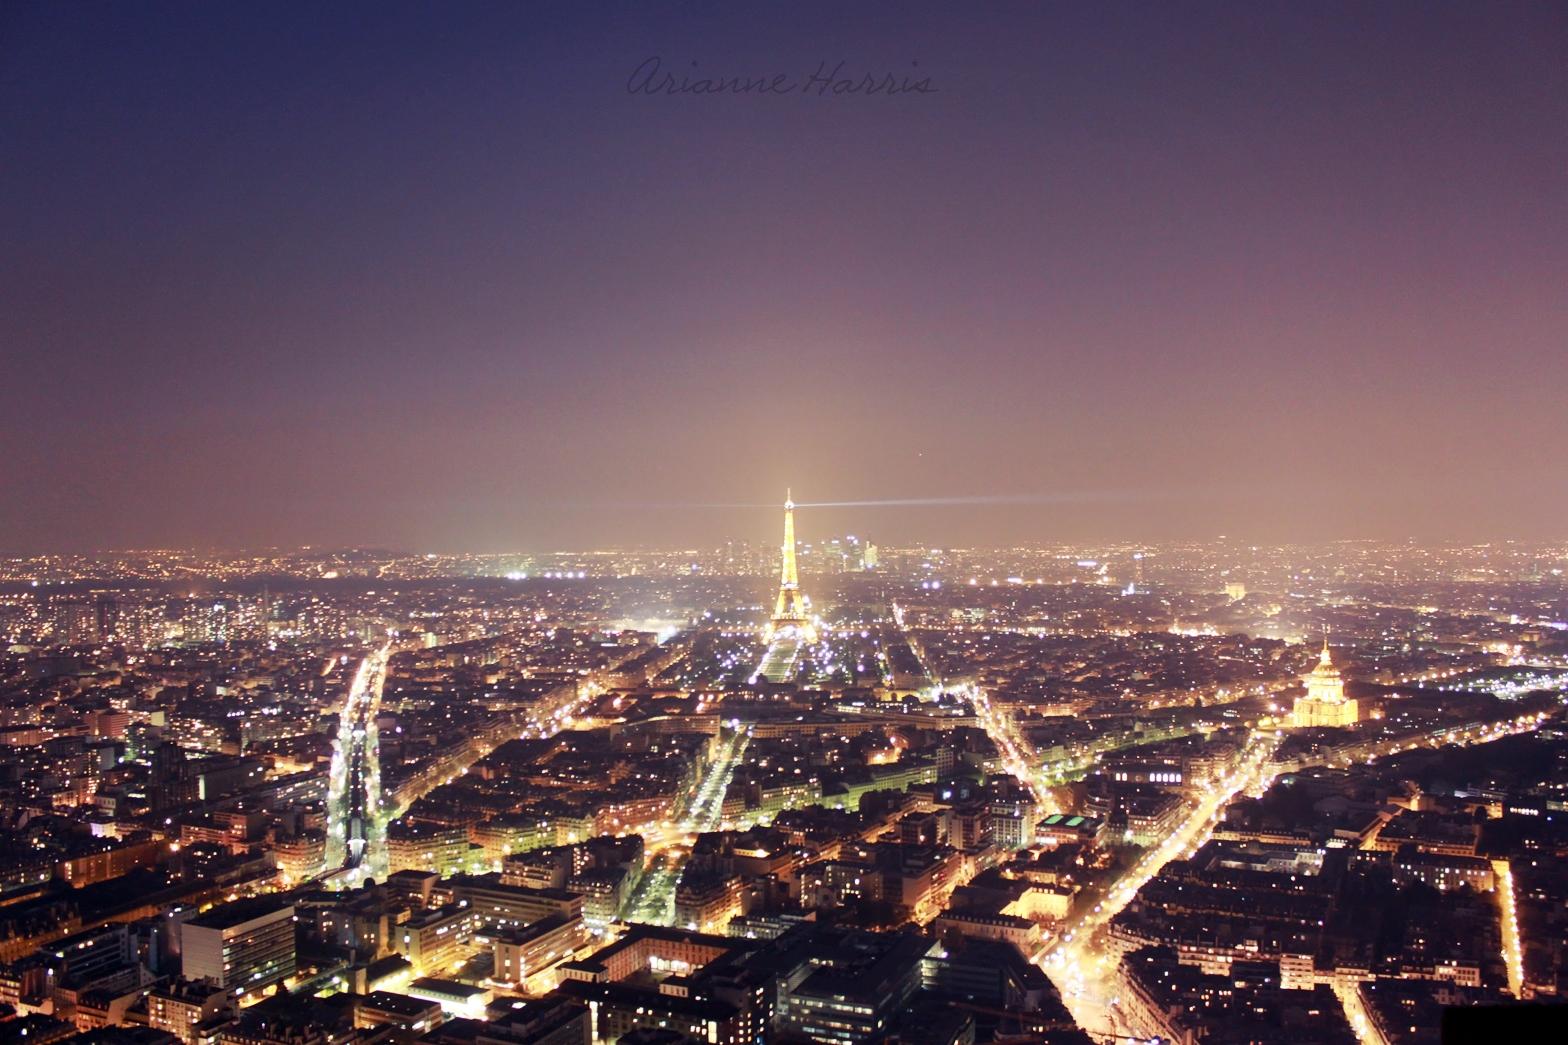 Wallpaper About Love With Quotes Paris Paris City Of Lights